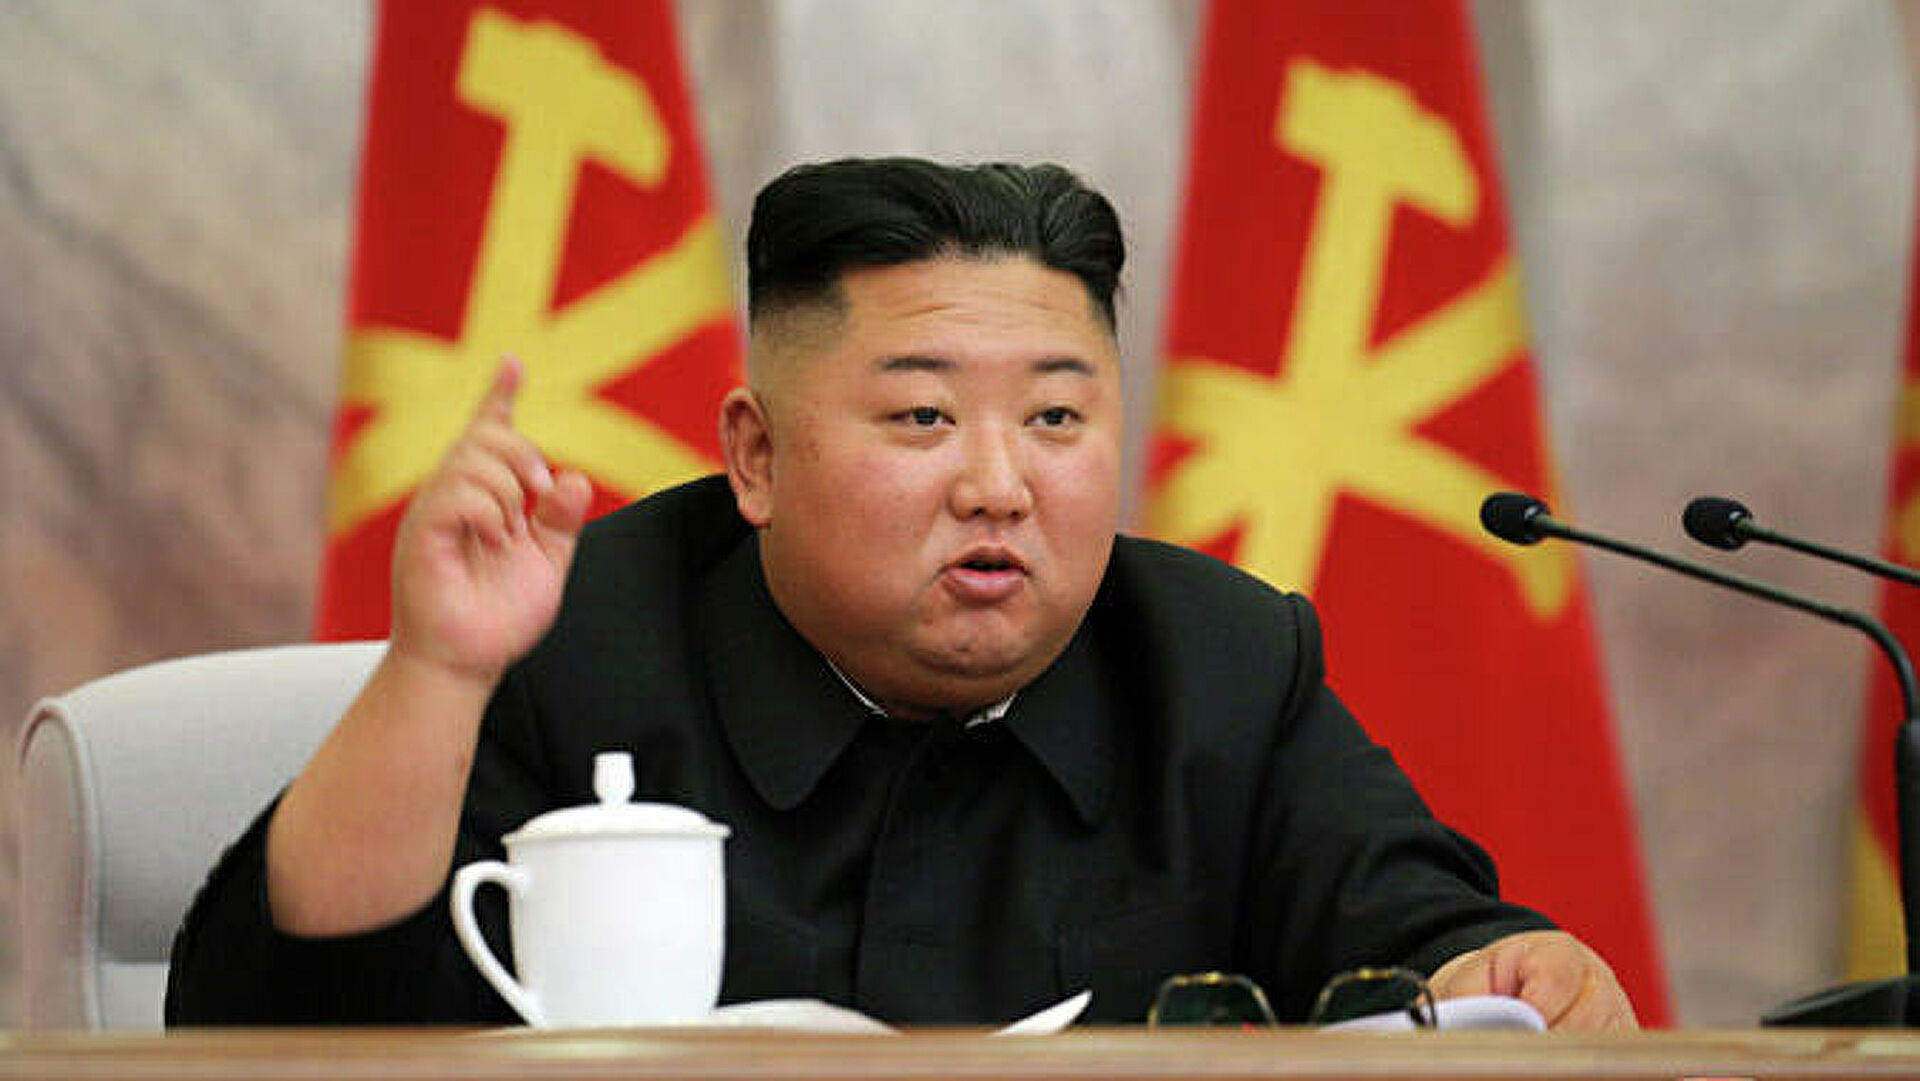 В КНДР до сих пор не выявили ни одного случая COVID-19